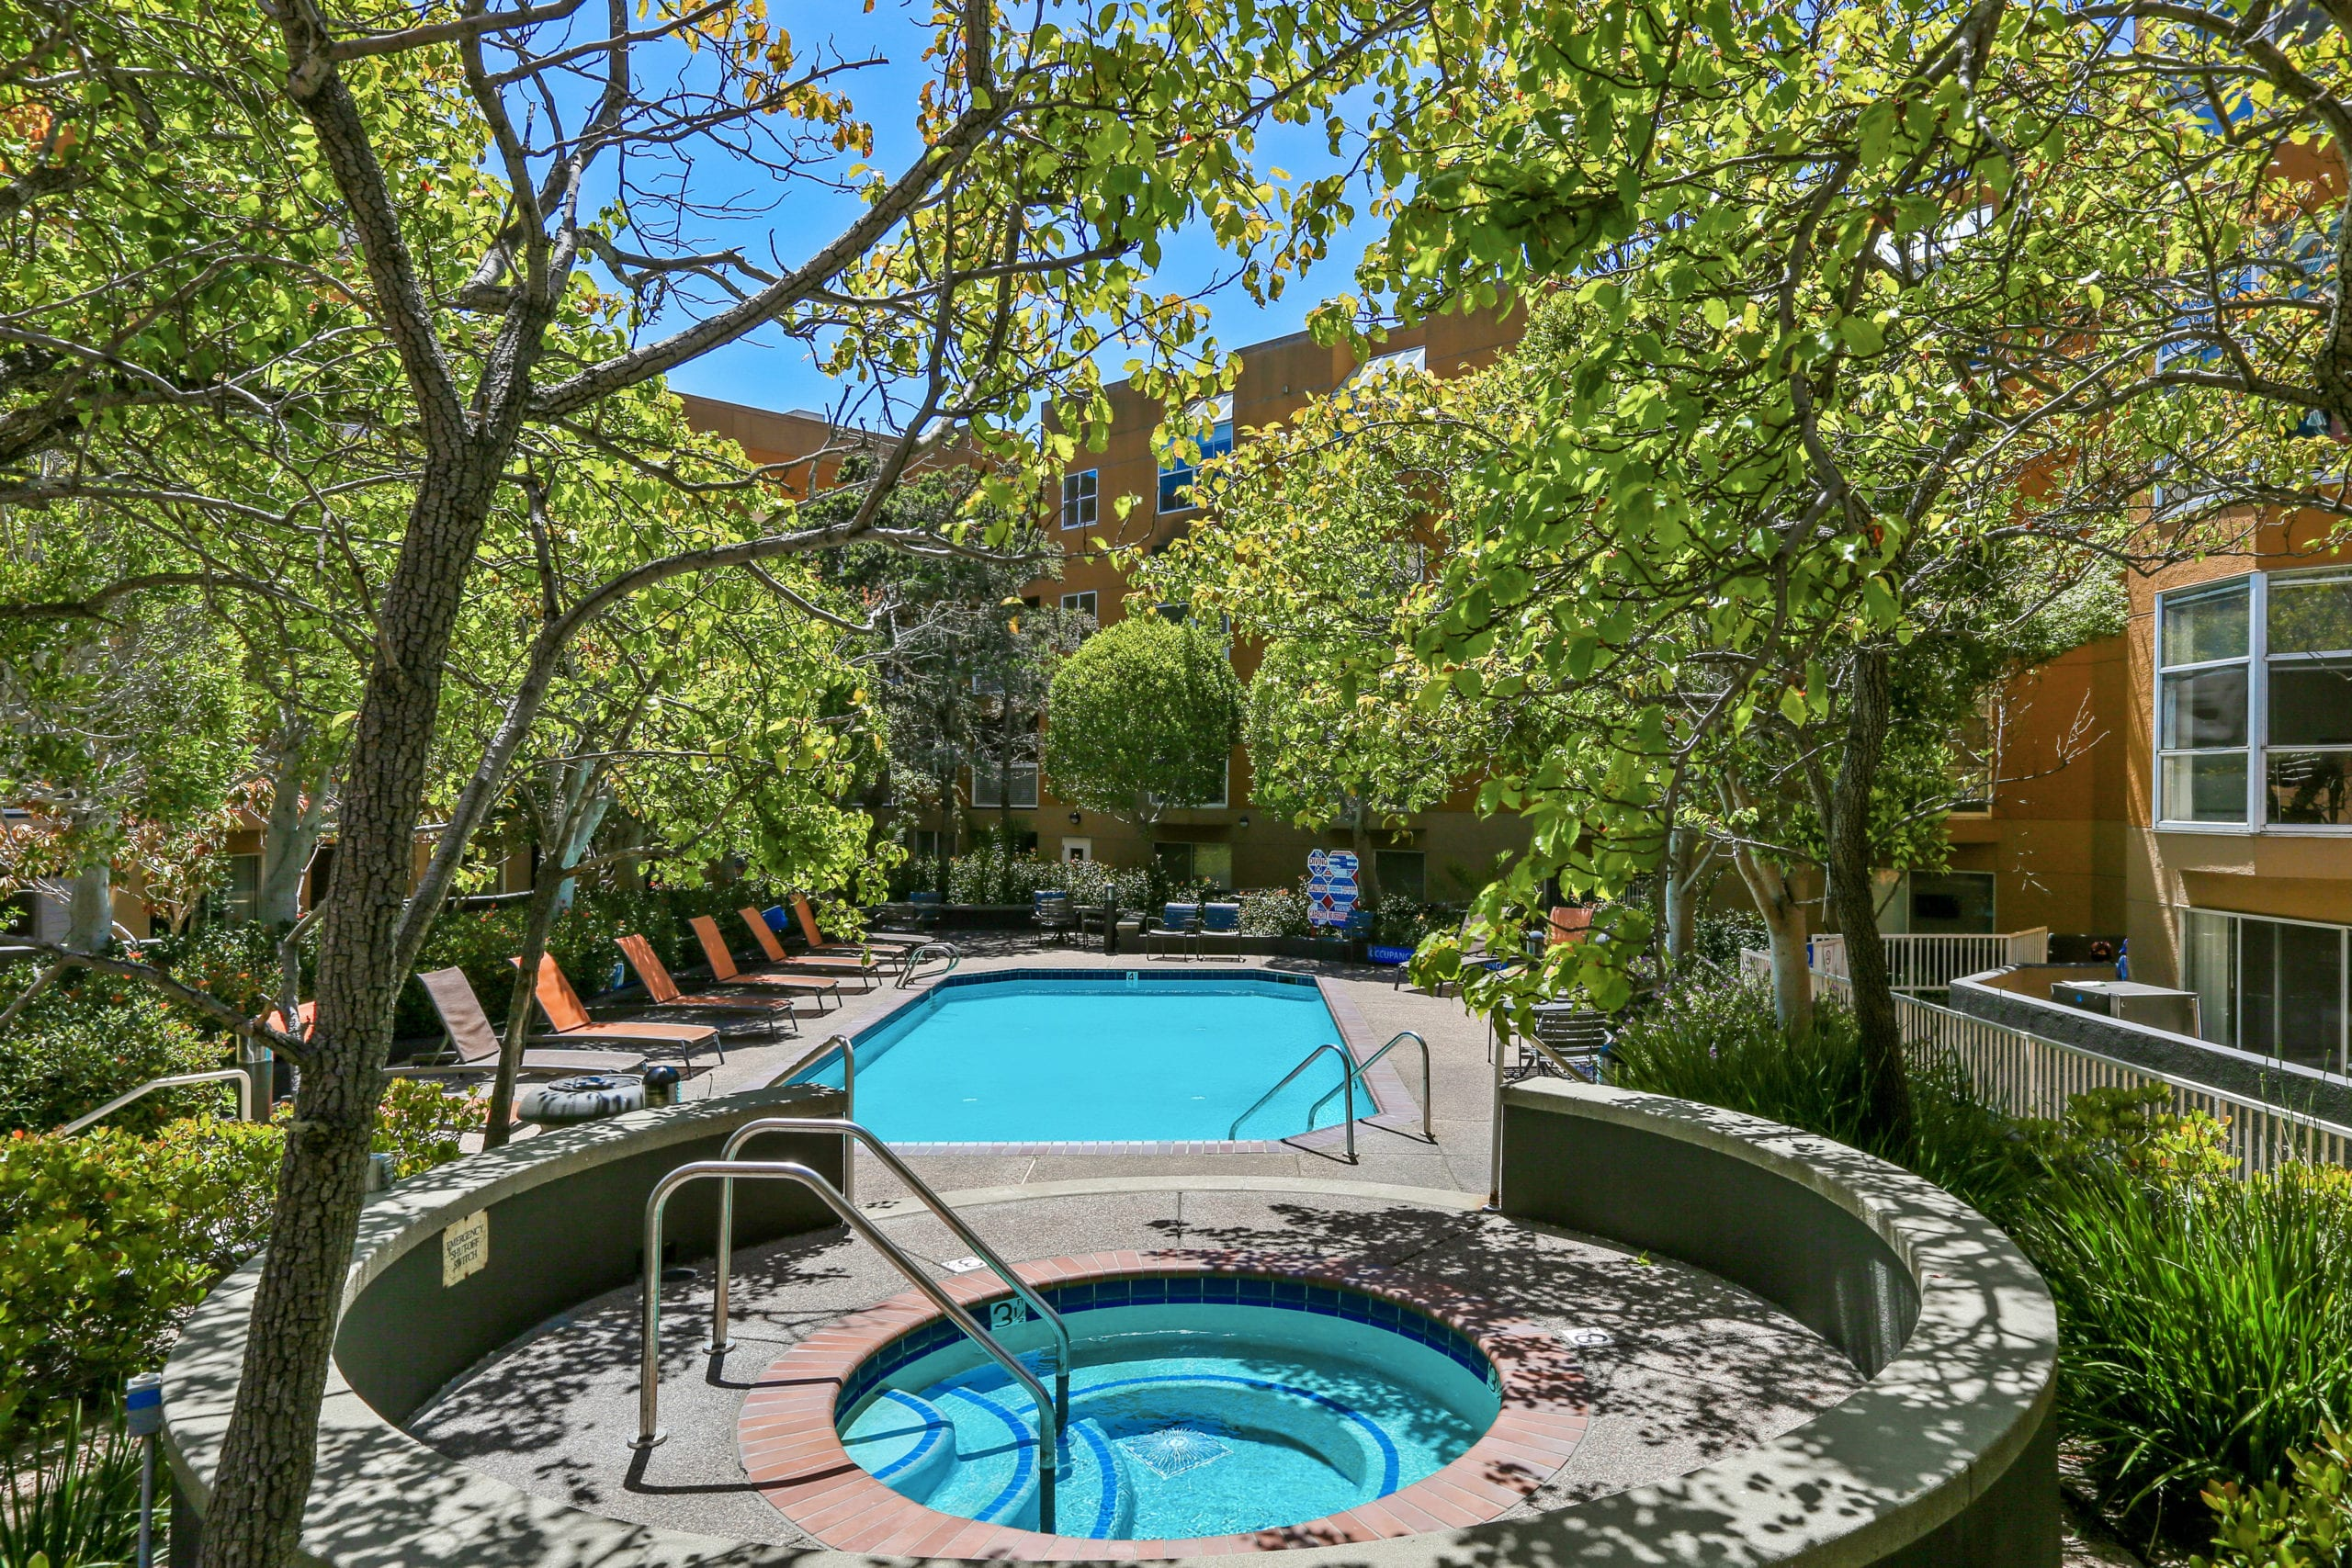 amenities at bayside village apartments